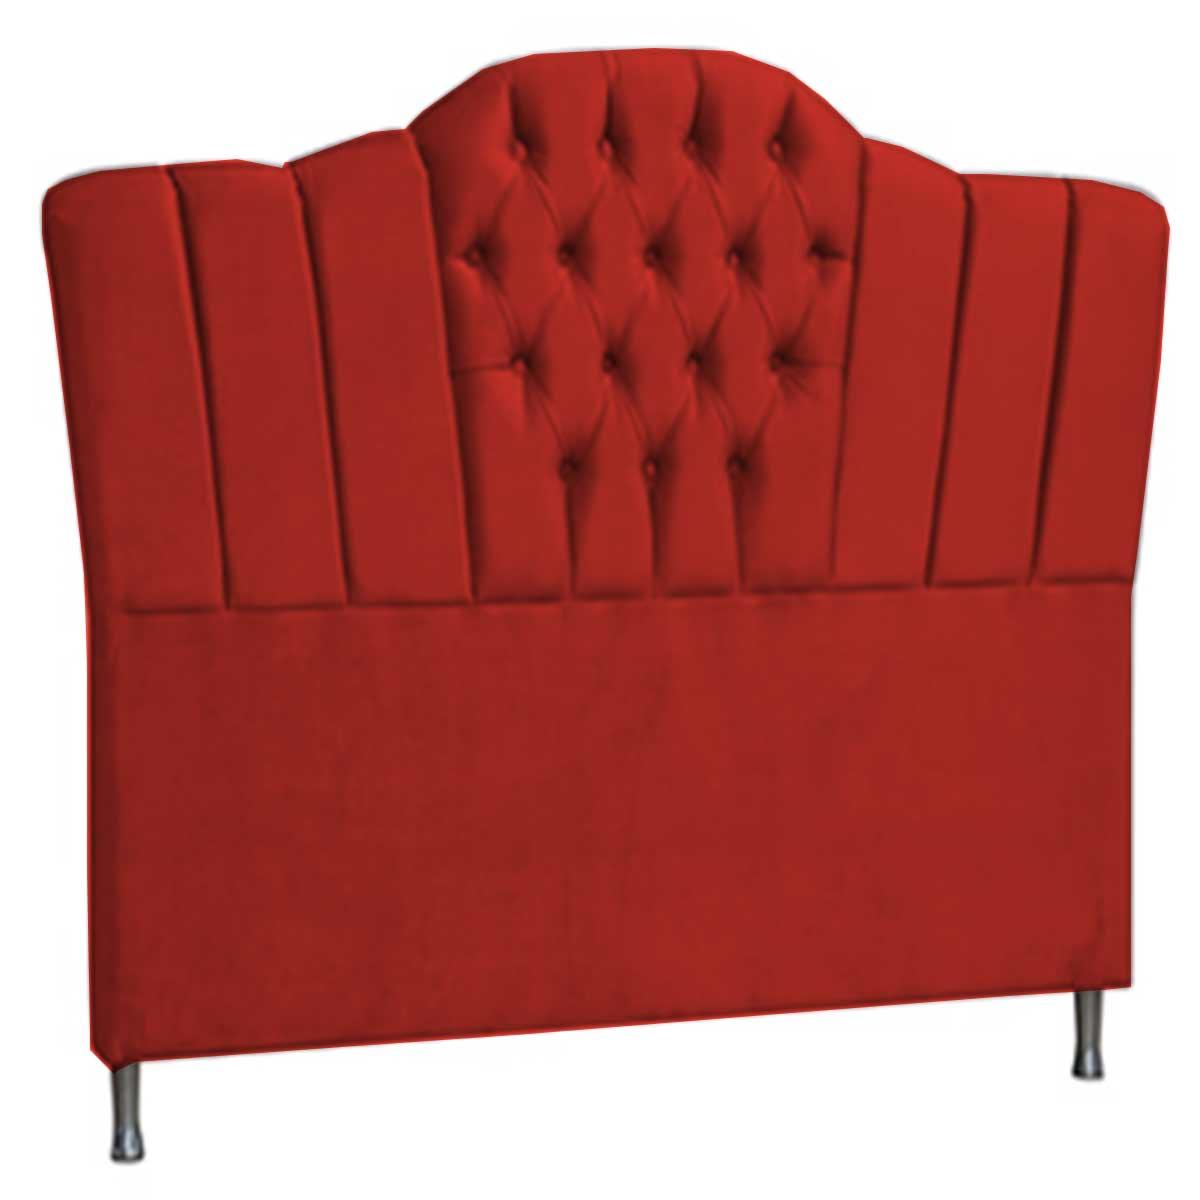 Cabeceira Zafira King 195 cm Vermelho Perfan Móveis